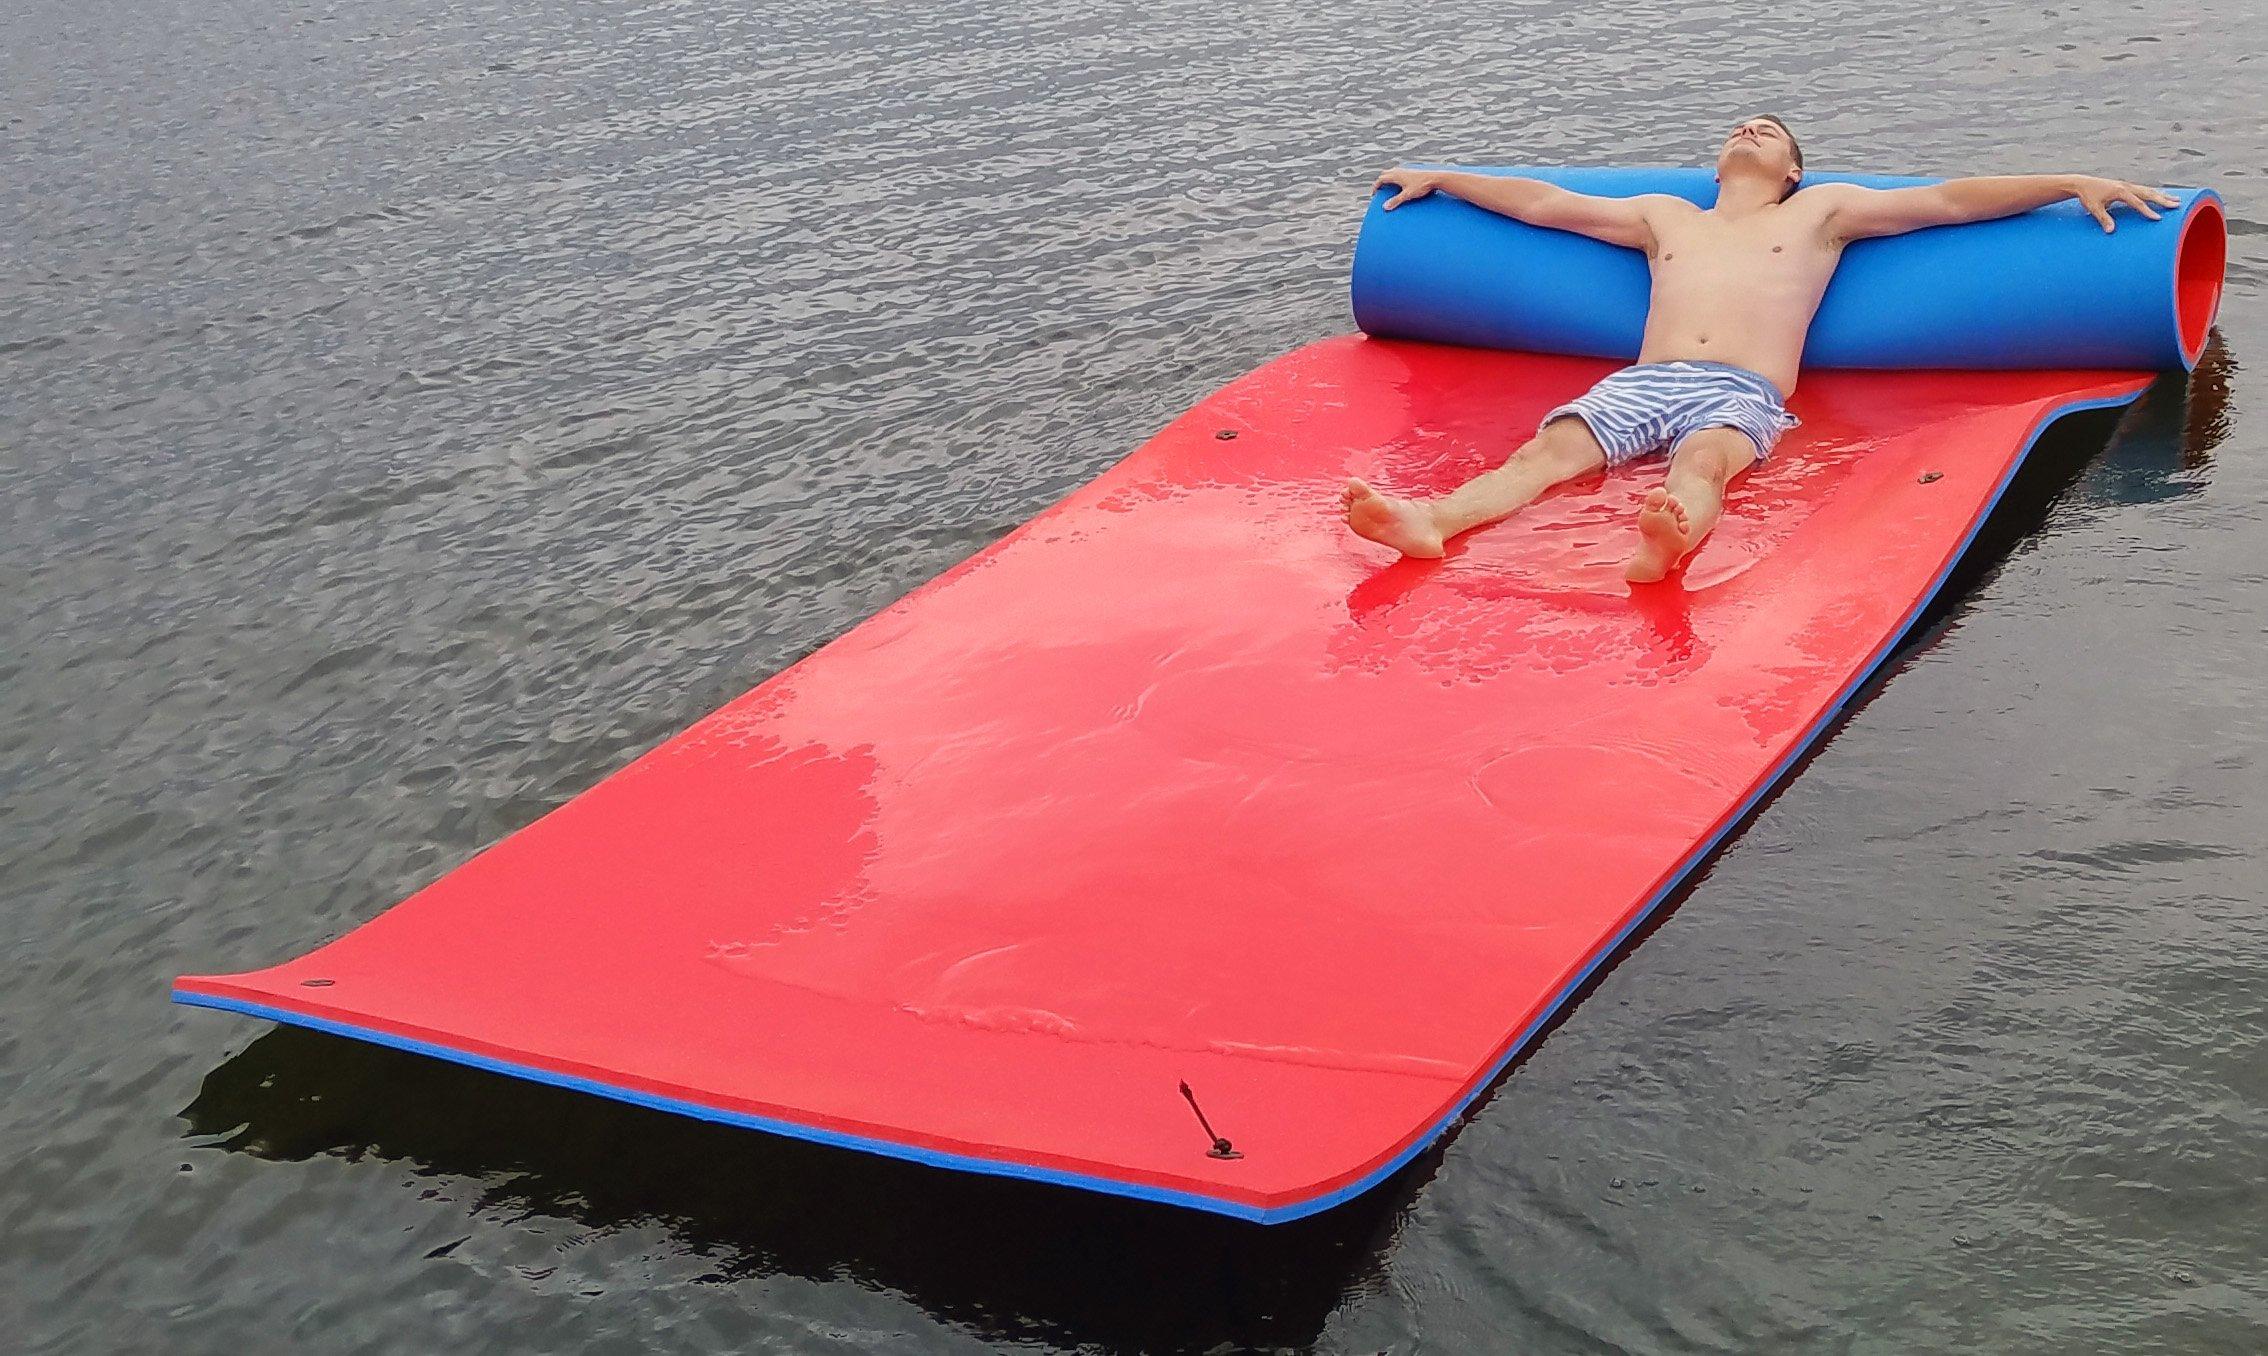 Vico Marine Floating Foam Pad - Red/Blue by Vico Marine (Image #6)